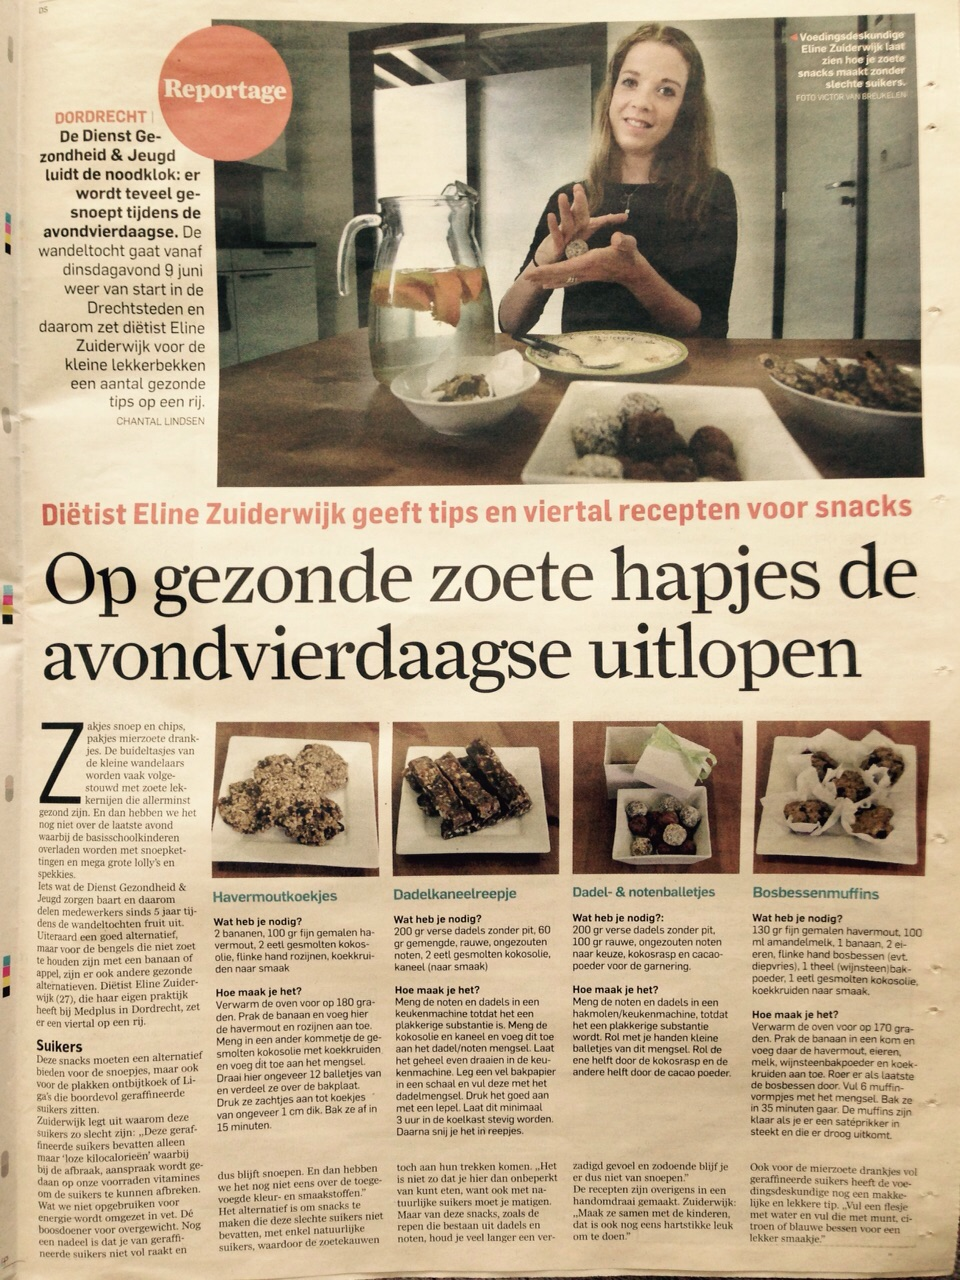 30-05-2015 AD - Dordrecht